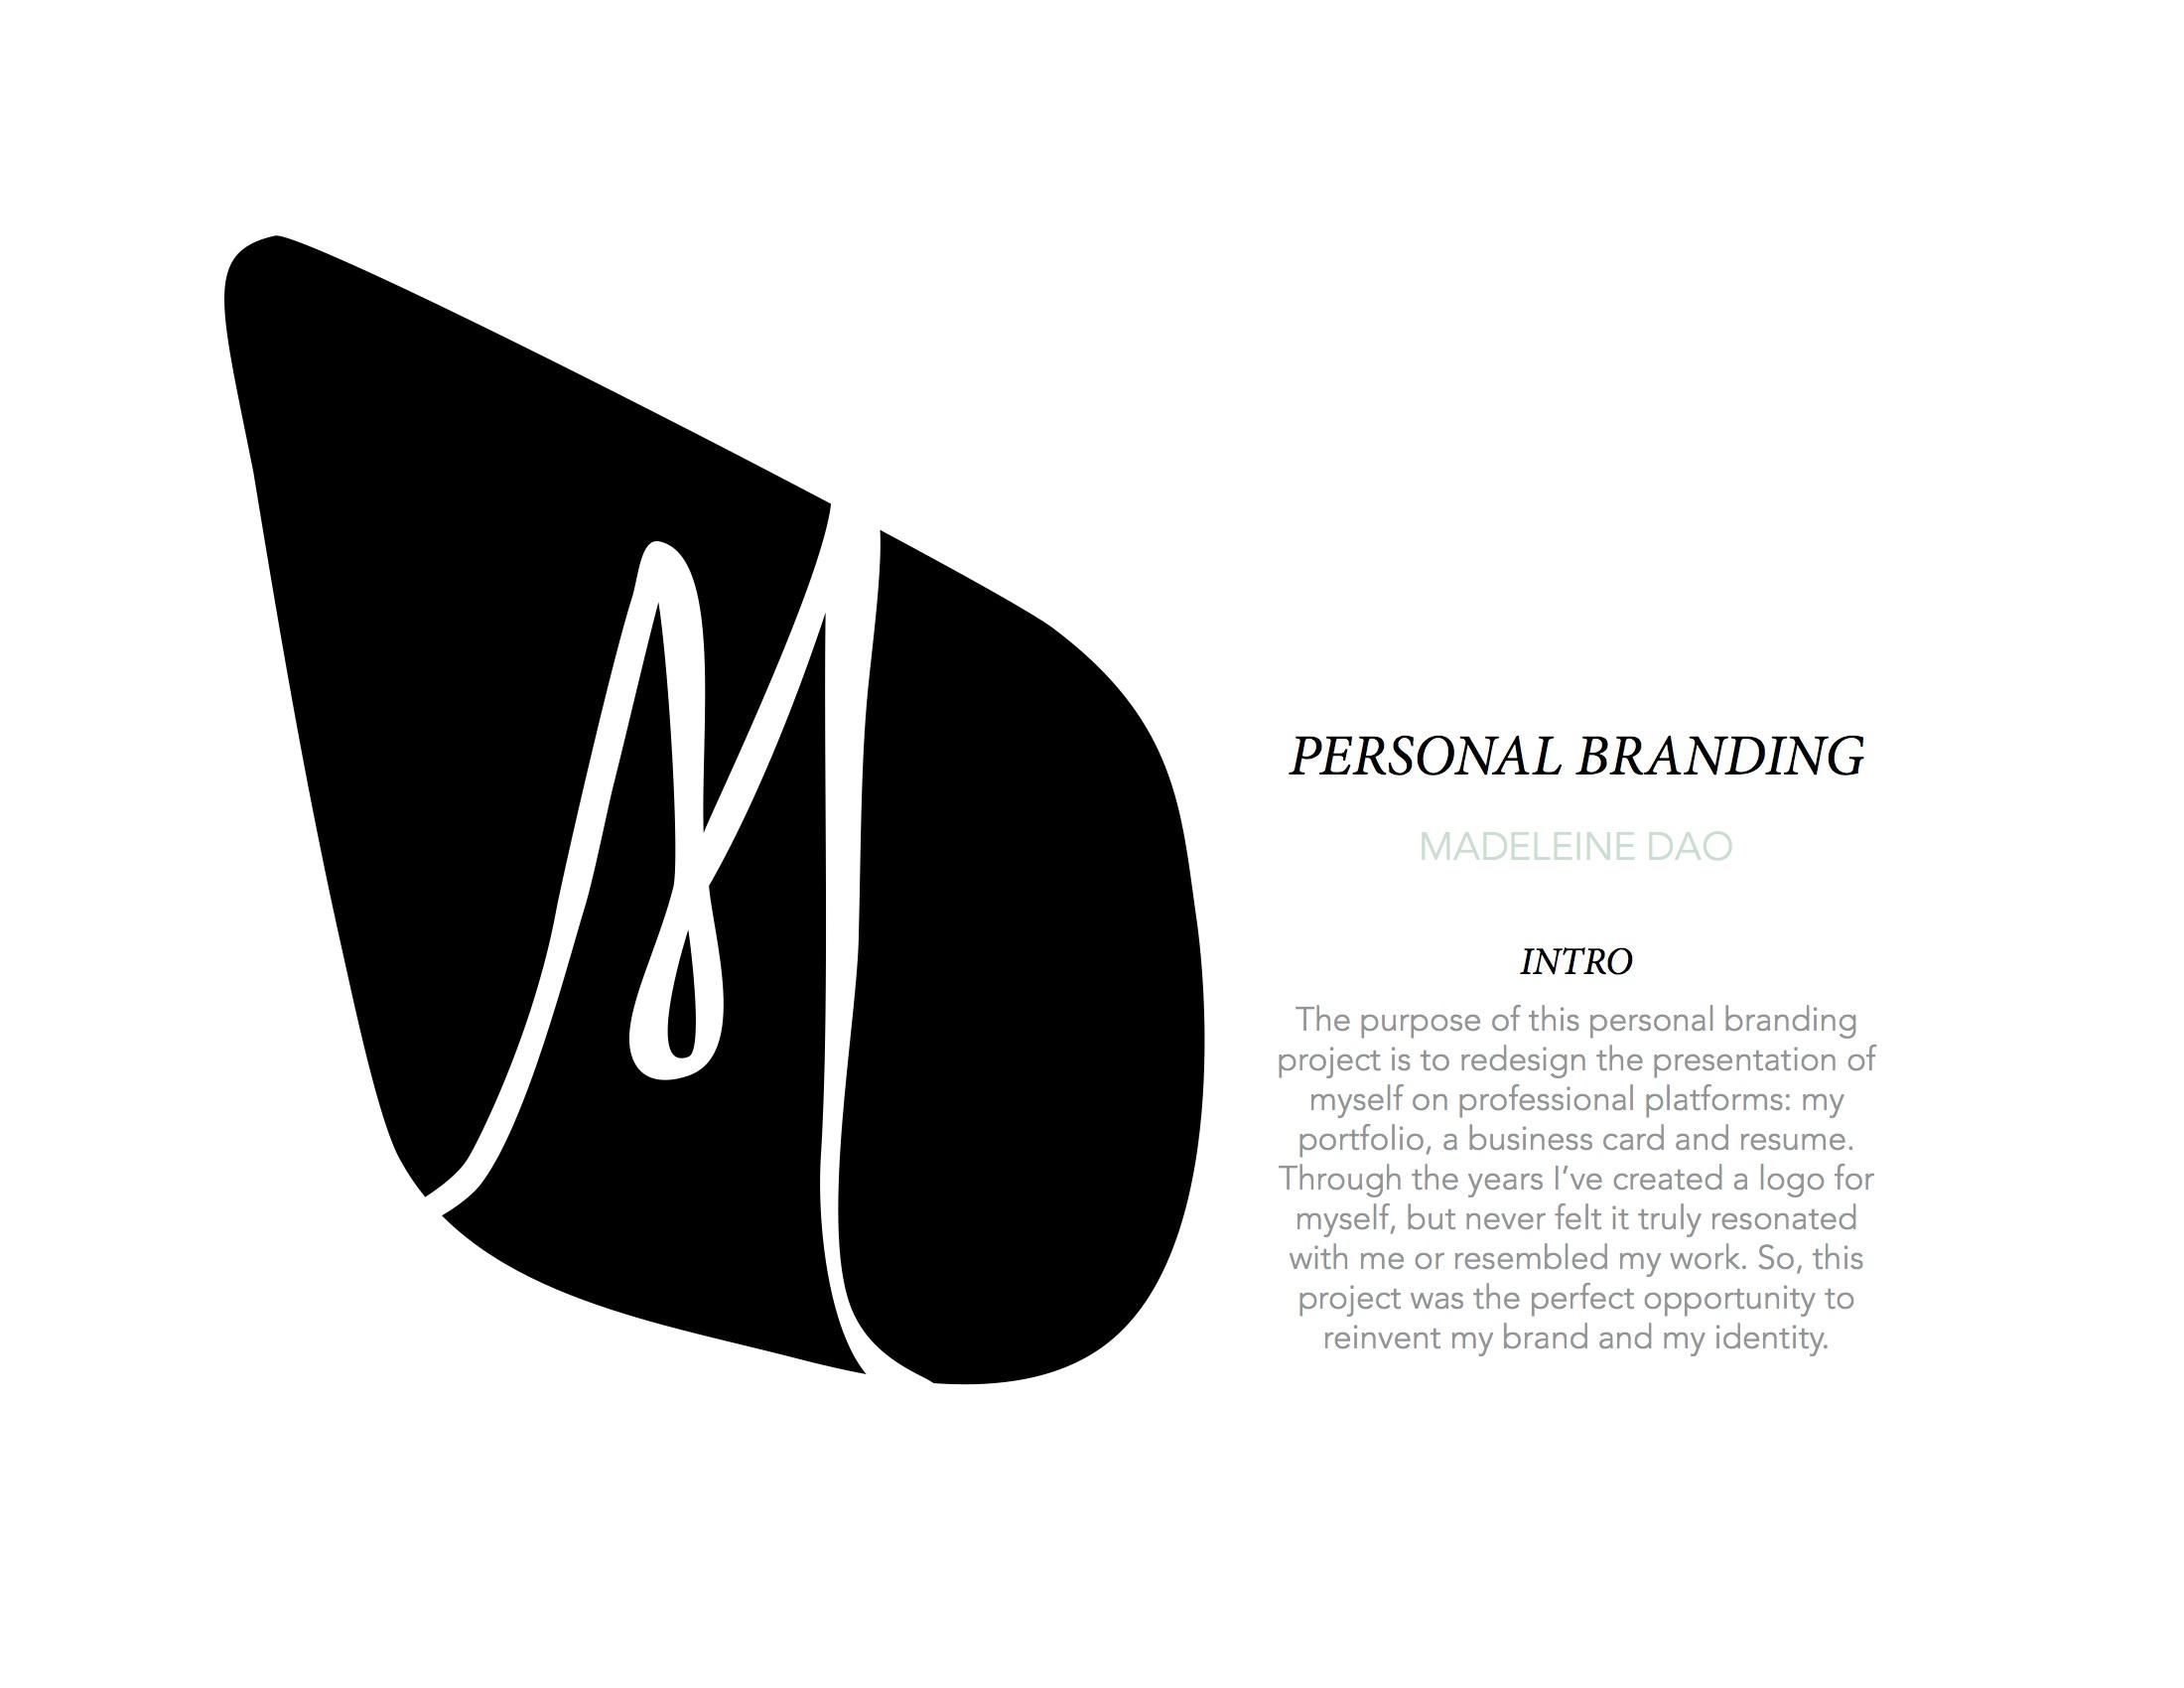 Personal Branding_Madeleine.Dao_FINAL.jpg